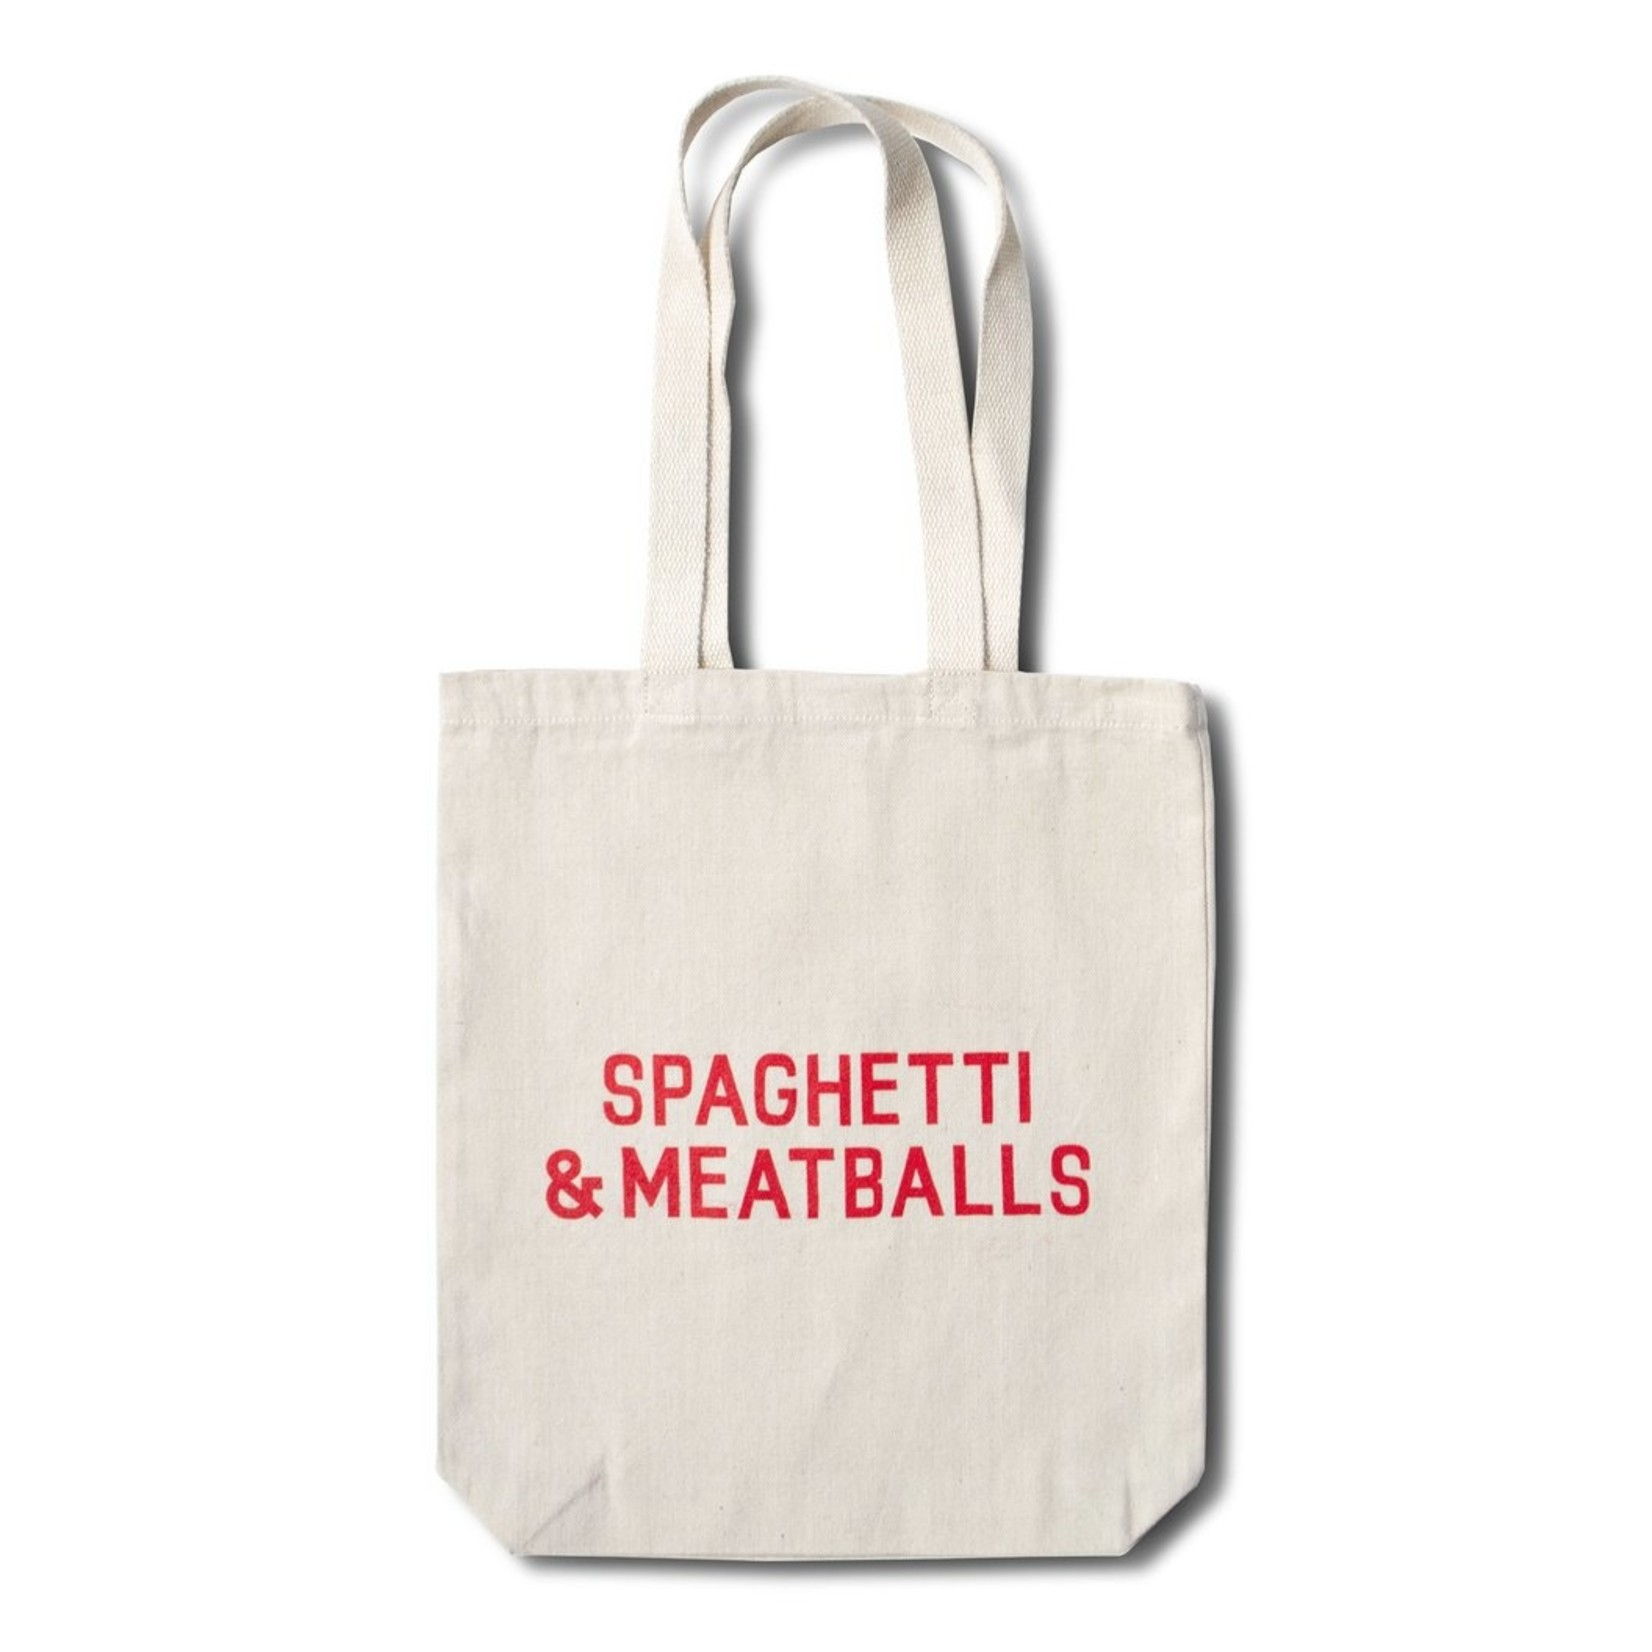 Banquet Workshop Spaghetti & MeatballsTote Bag